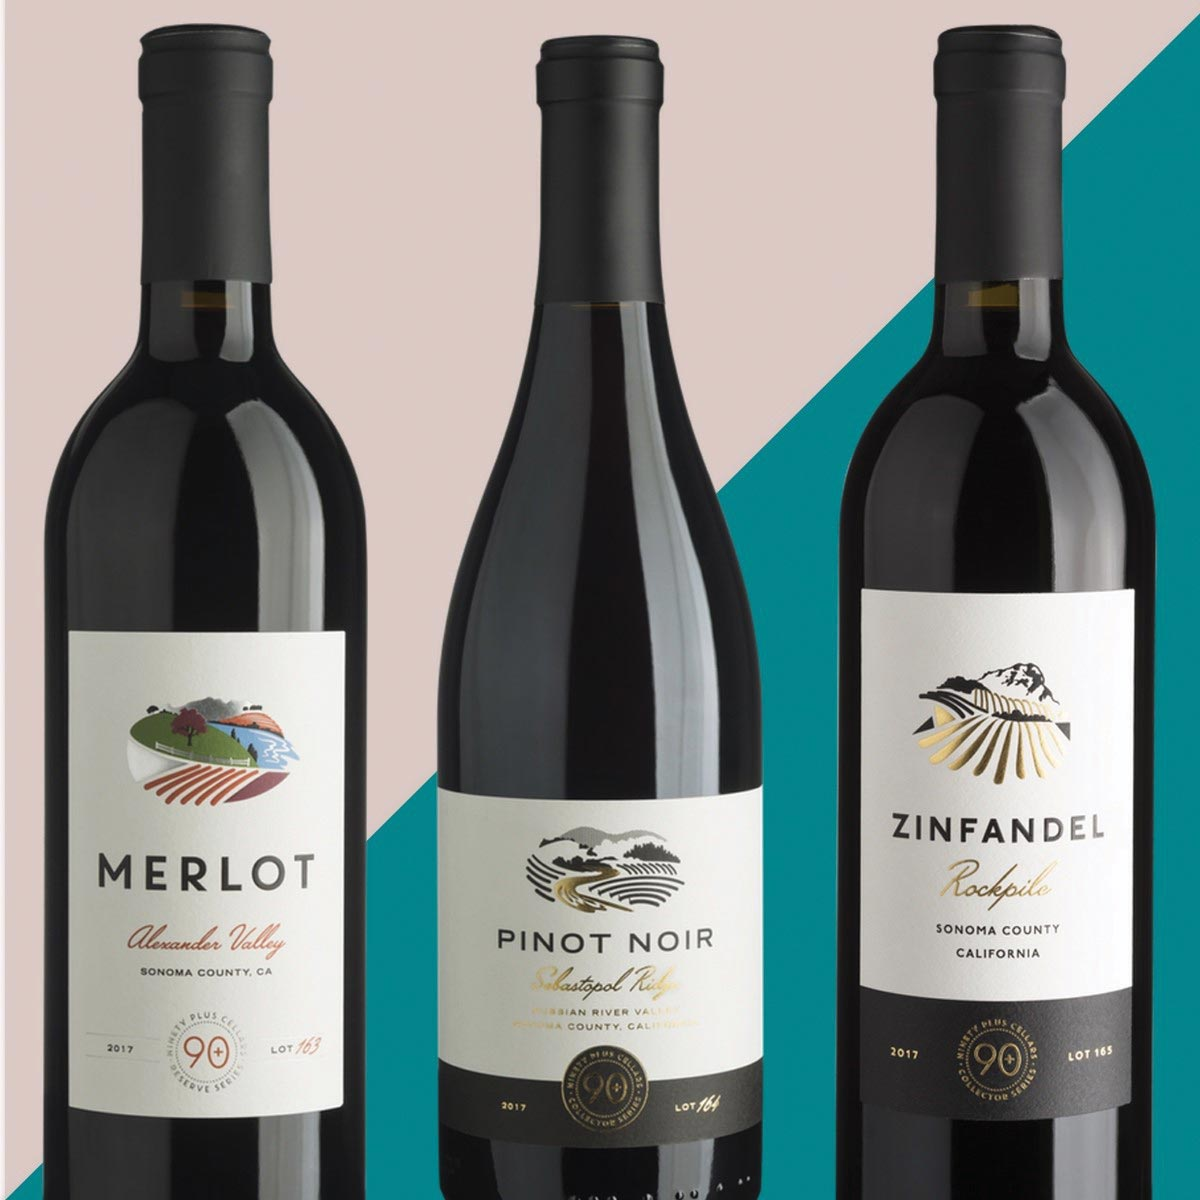 90+ Cellars Adds Three New California Wines